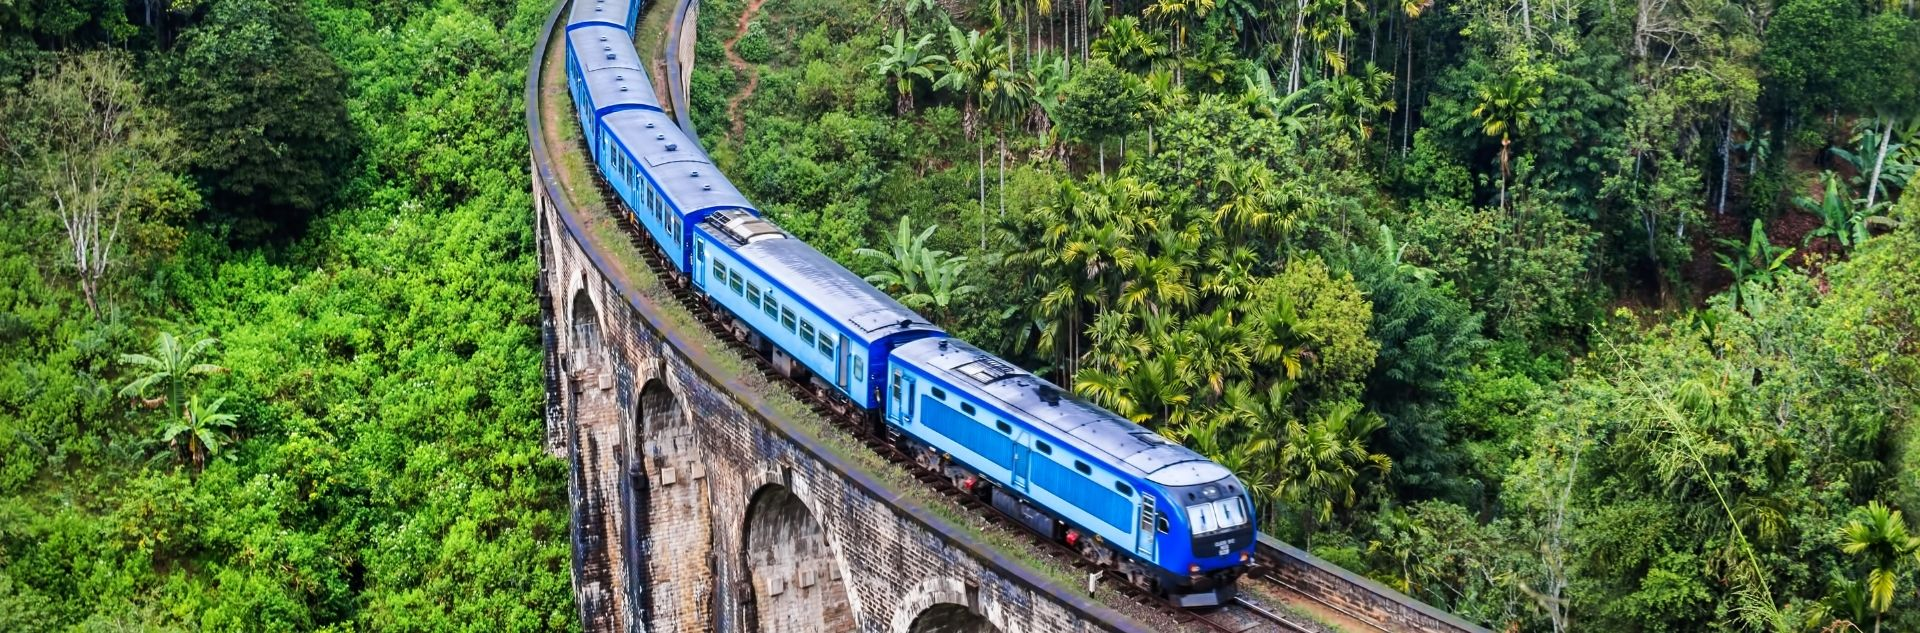 Zug Tee Express Sri Lanka